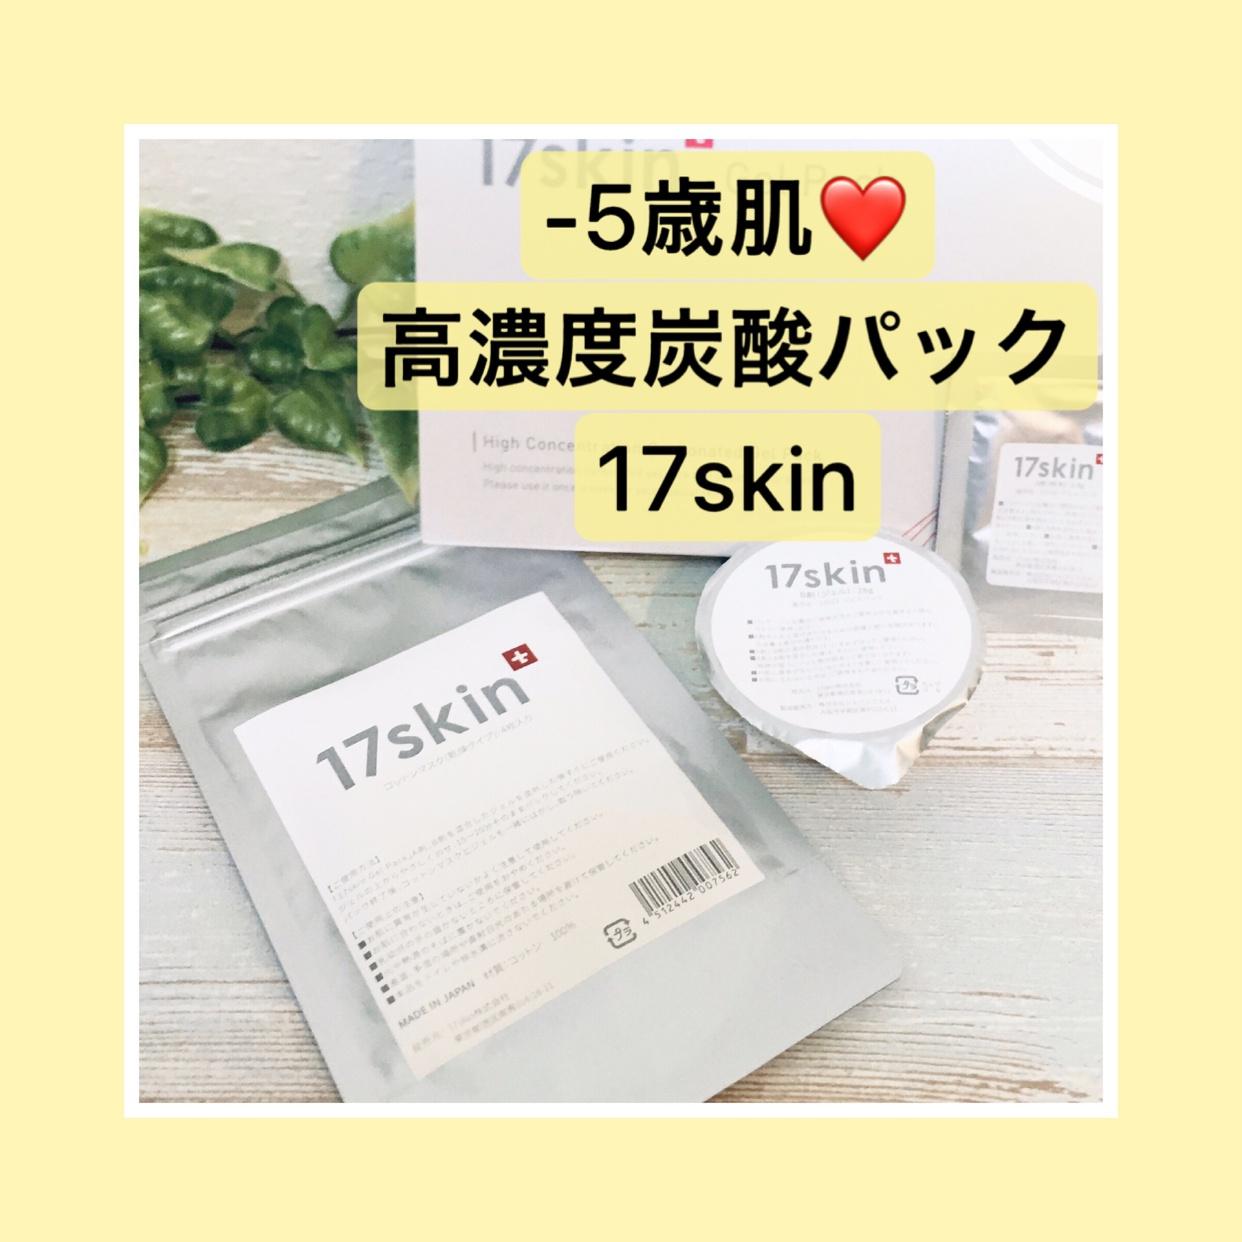 17skin(イチナナスキン) 高濃度炭酸パックの良い点・メリットに関する有姫さんの口コミ画像1